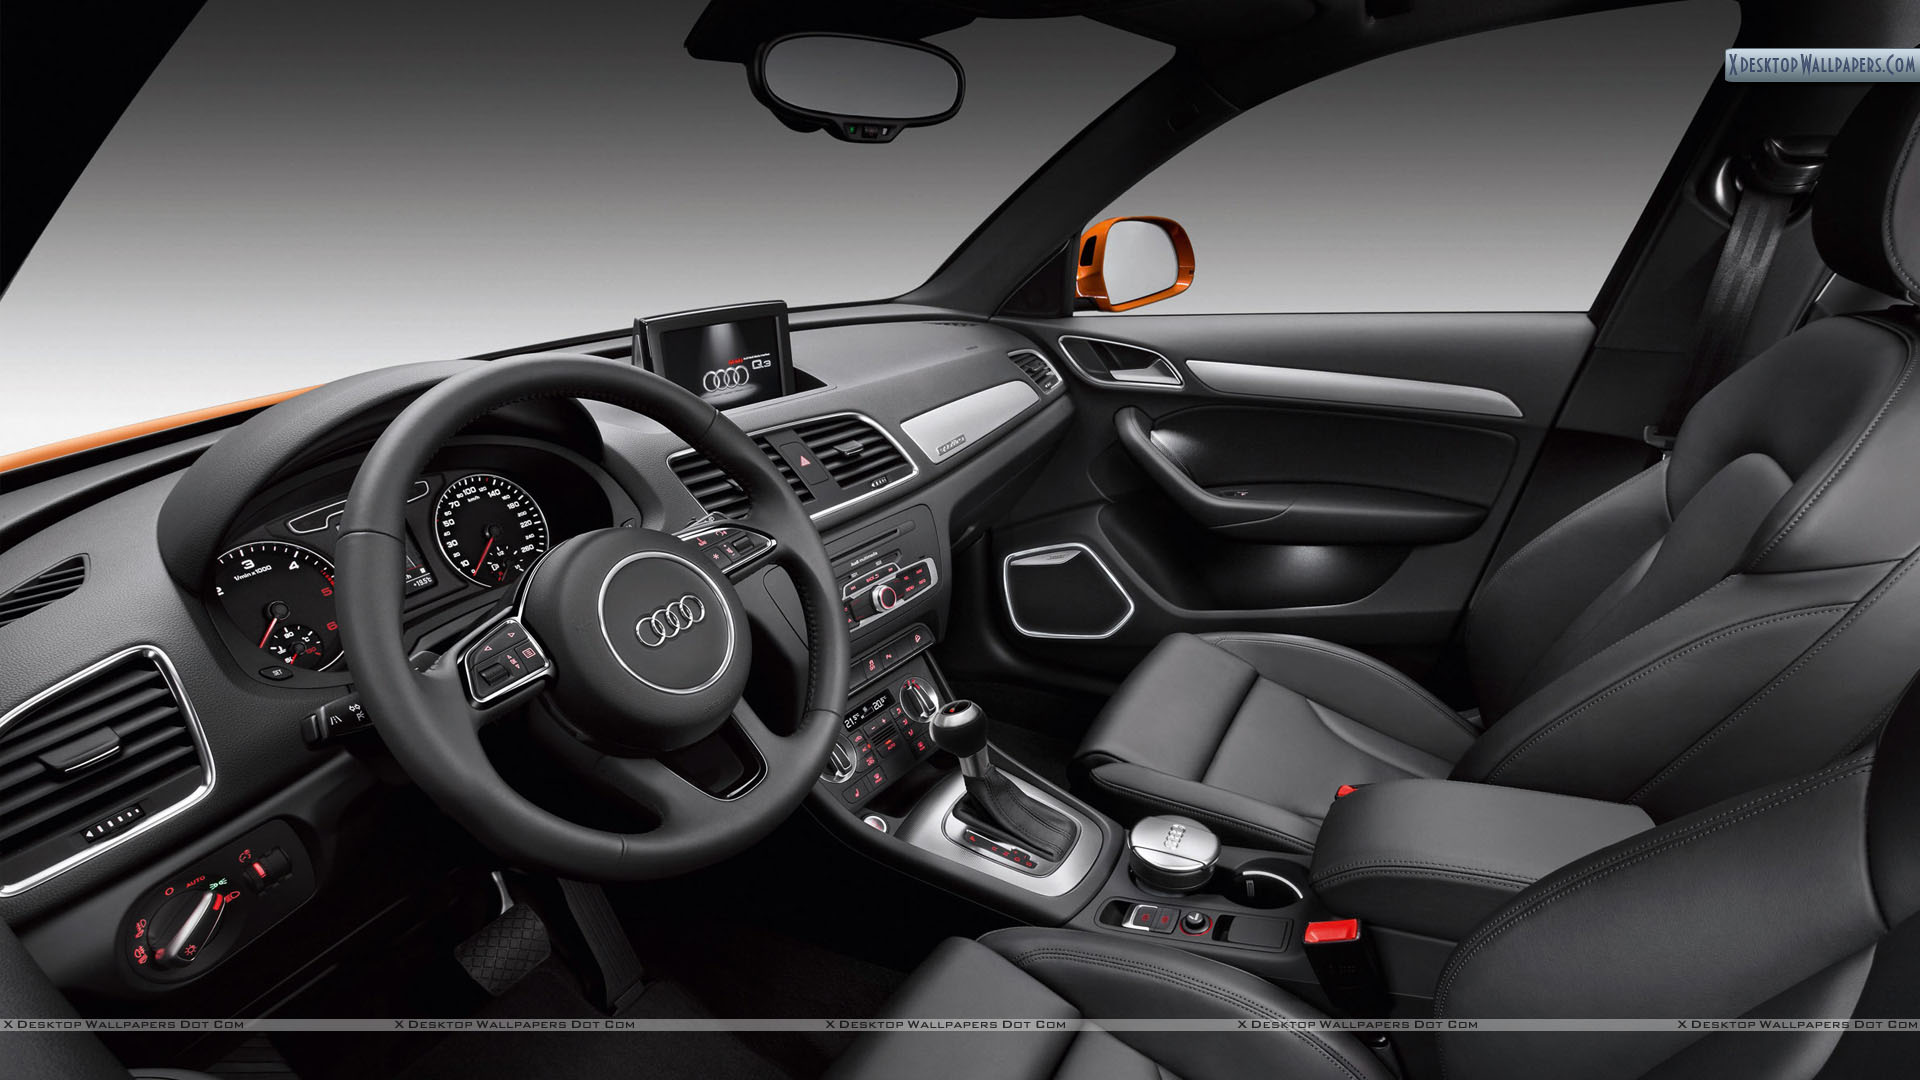 Audi Q3 Interior Picture Wallpaper 1920x1080